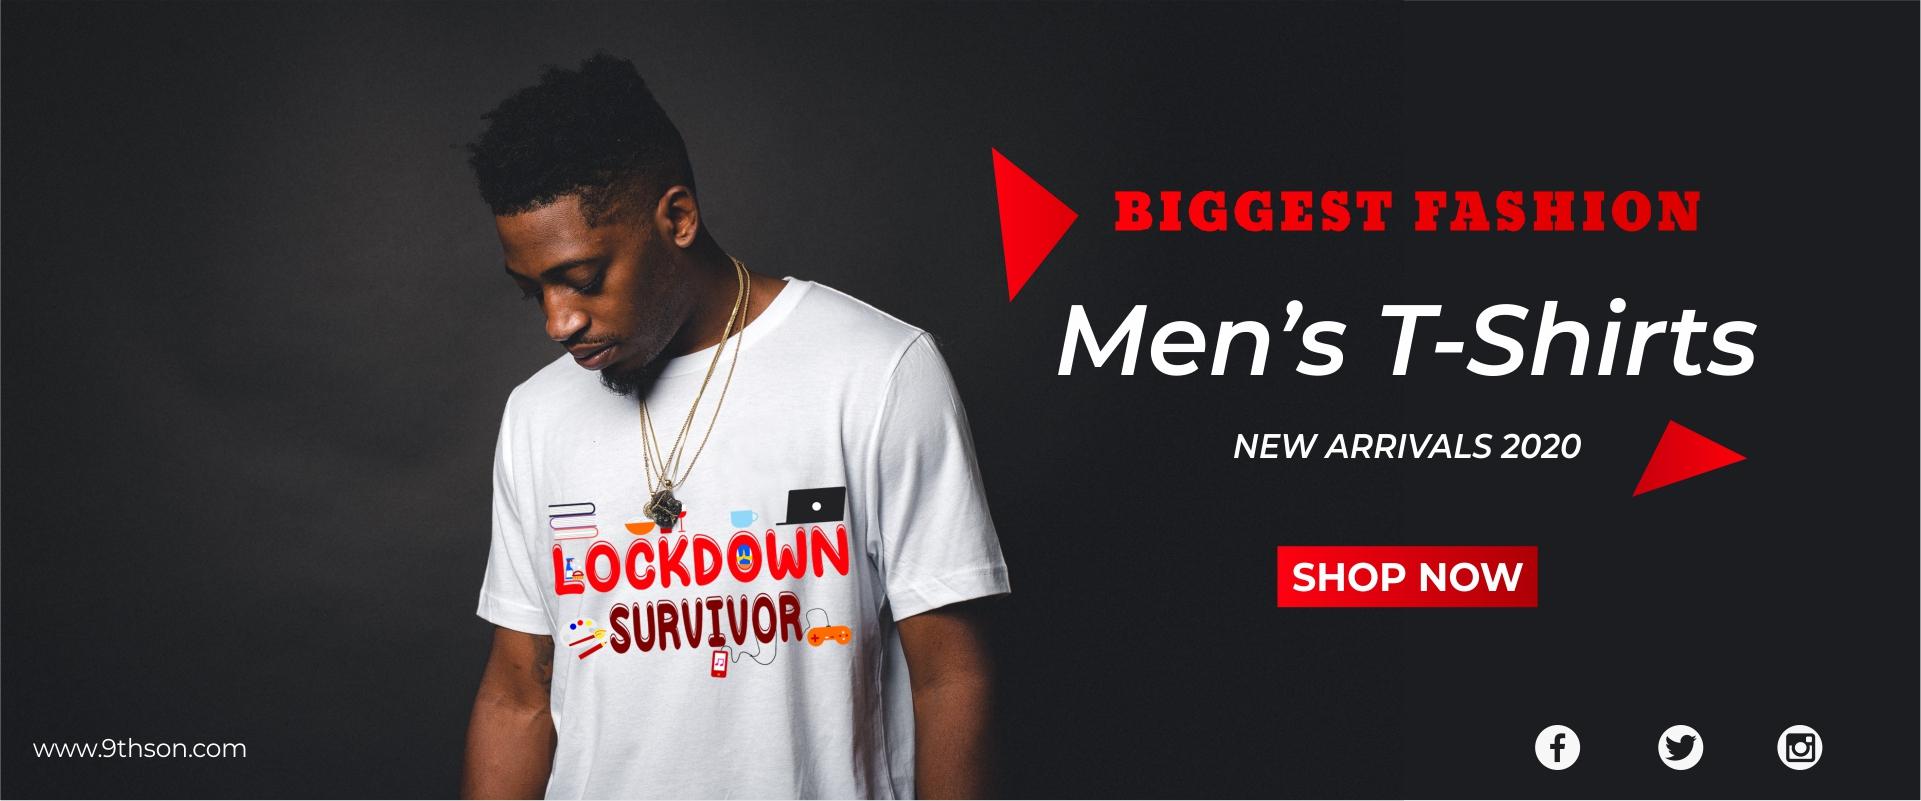 Lock Down Survior Mens T Shirt - Online